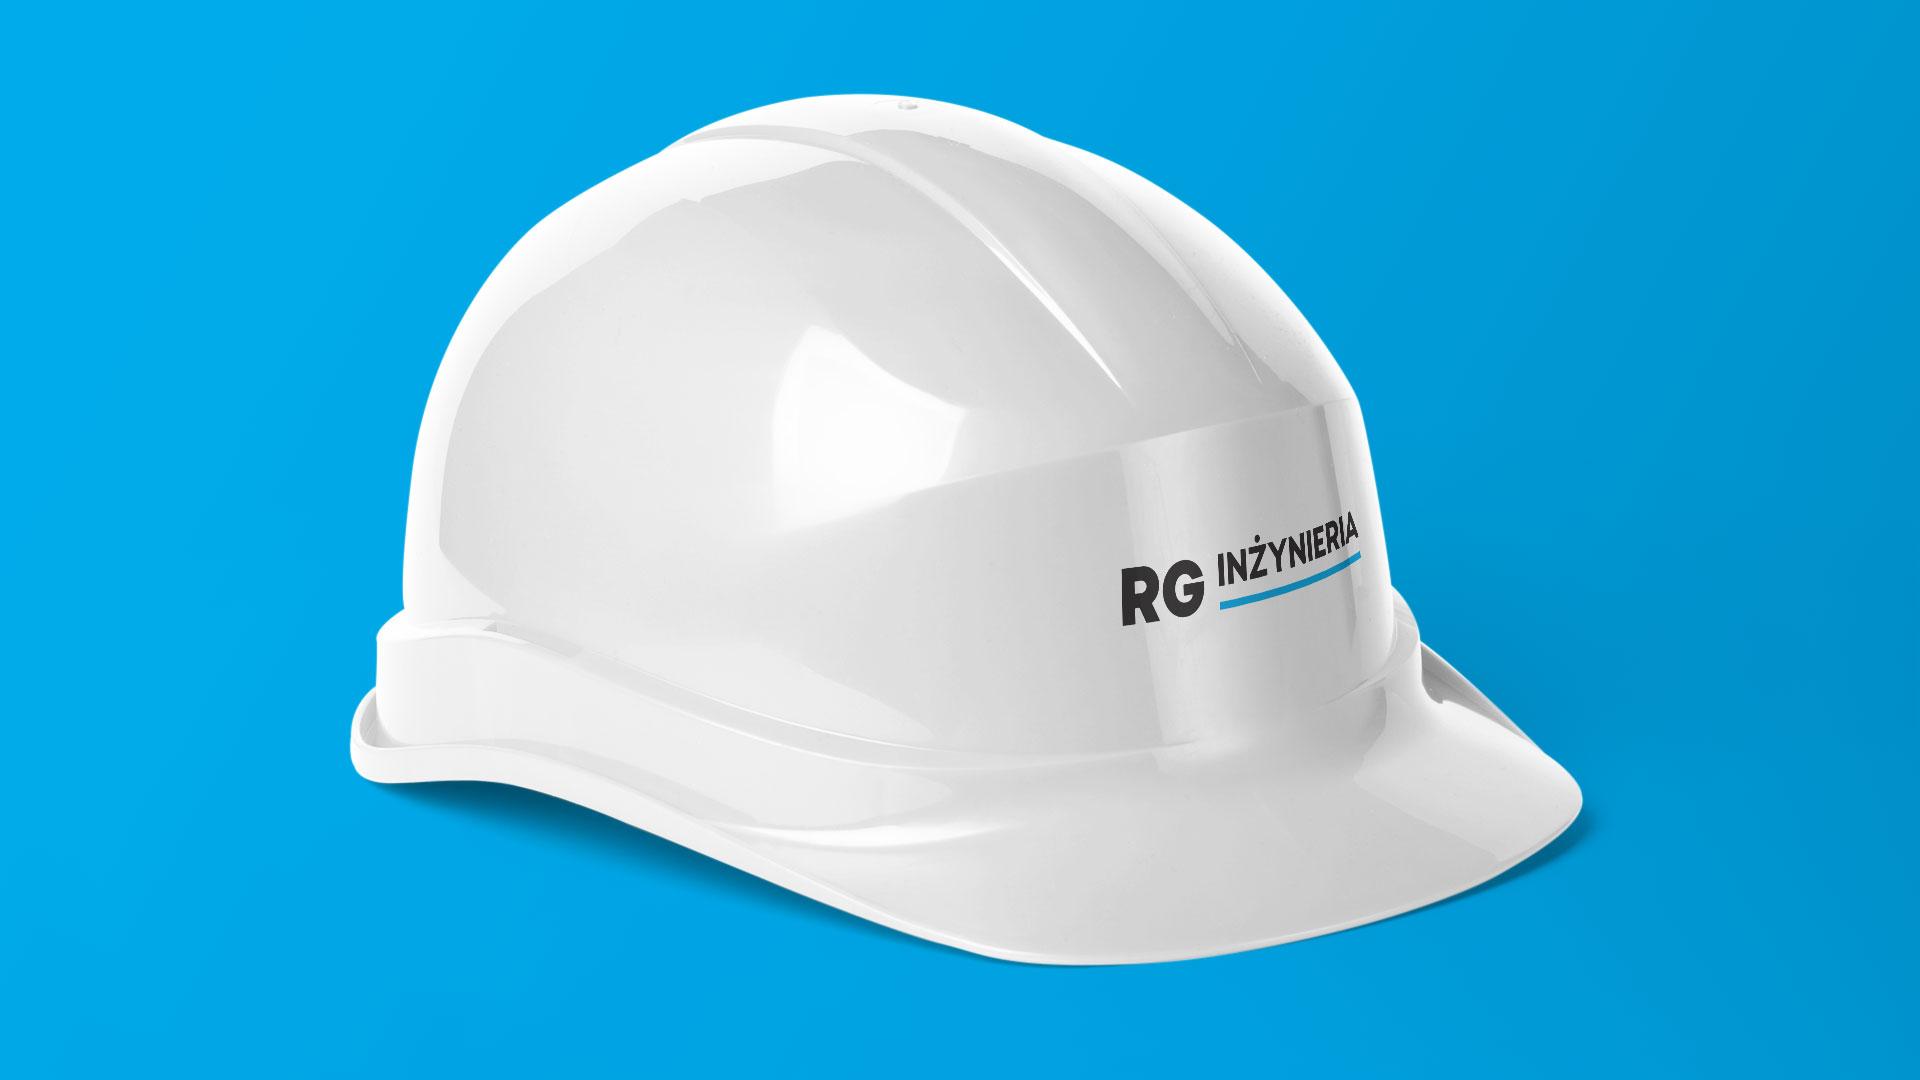 RG Inżynieria